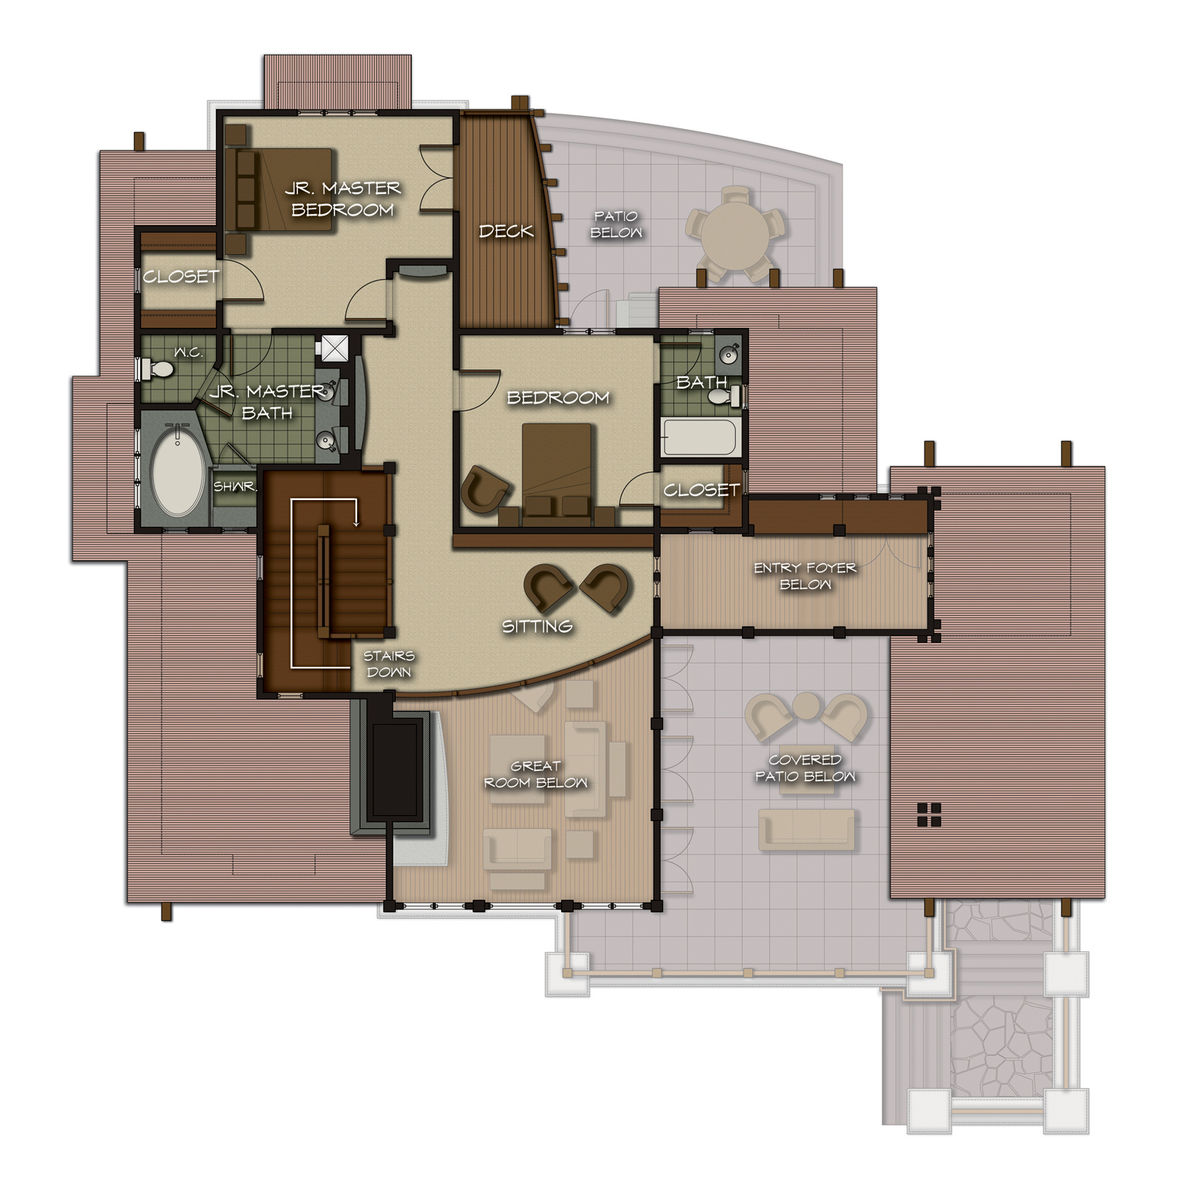 The castle rock floor plan by canadian timber frames ltd for Castle rock floor plans